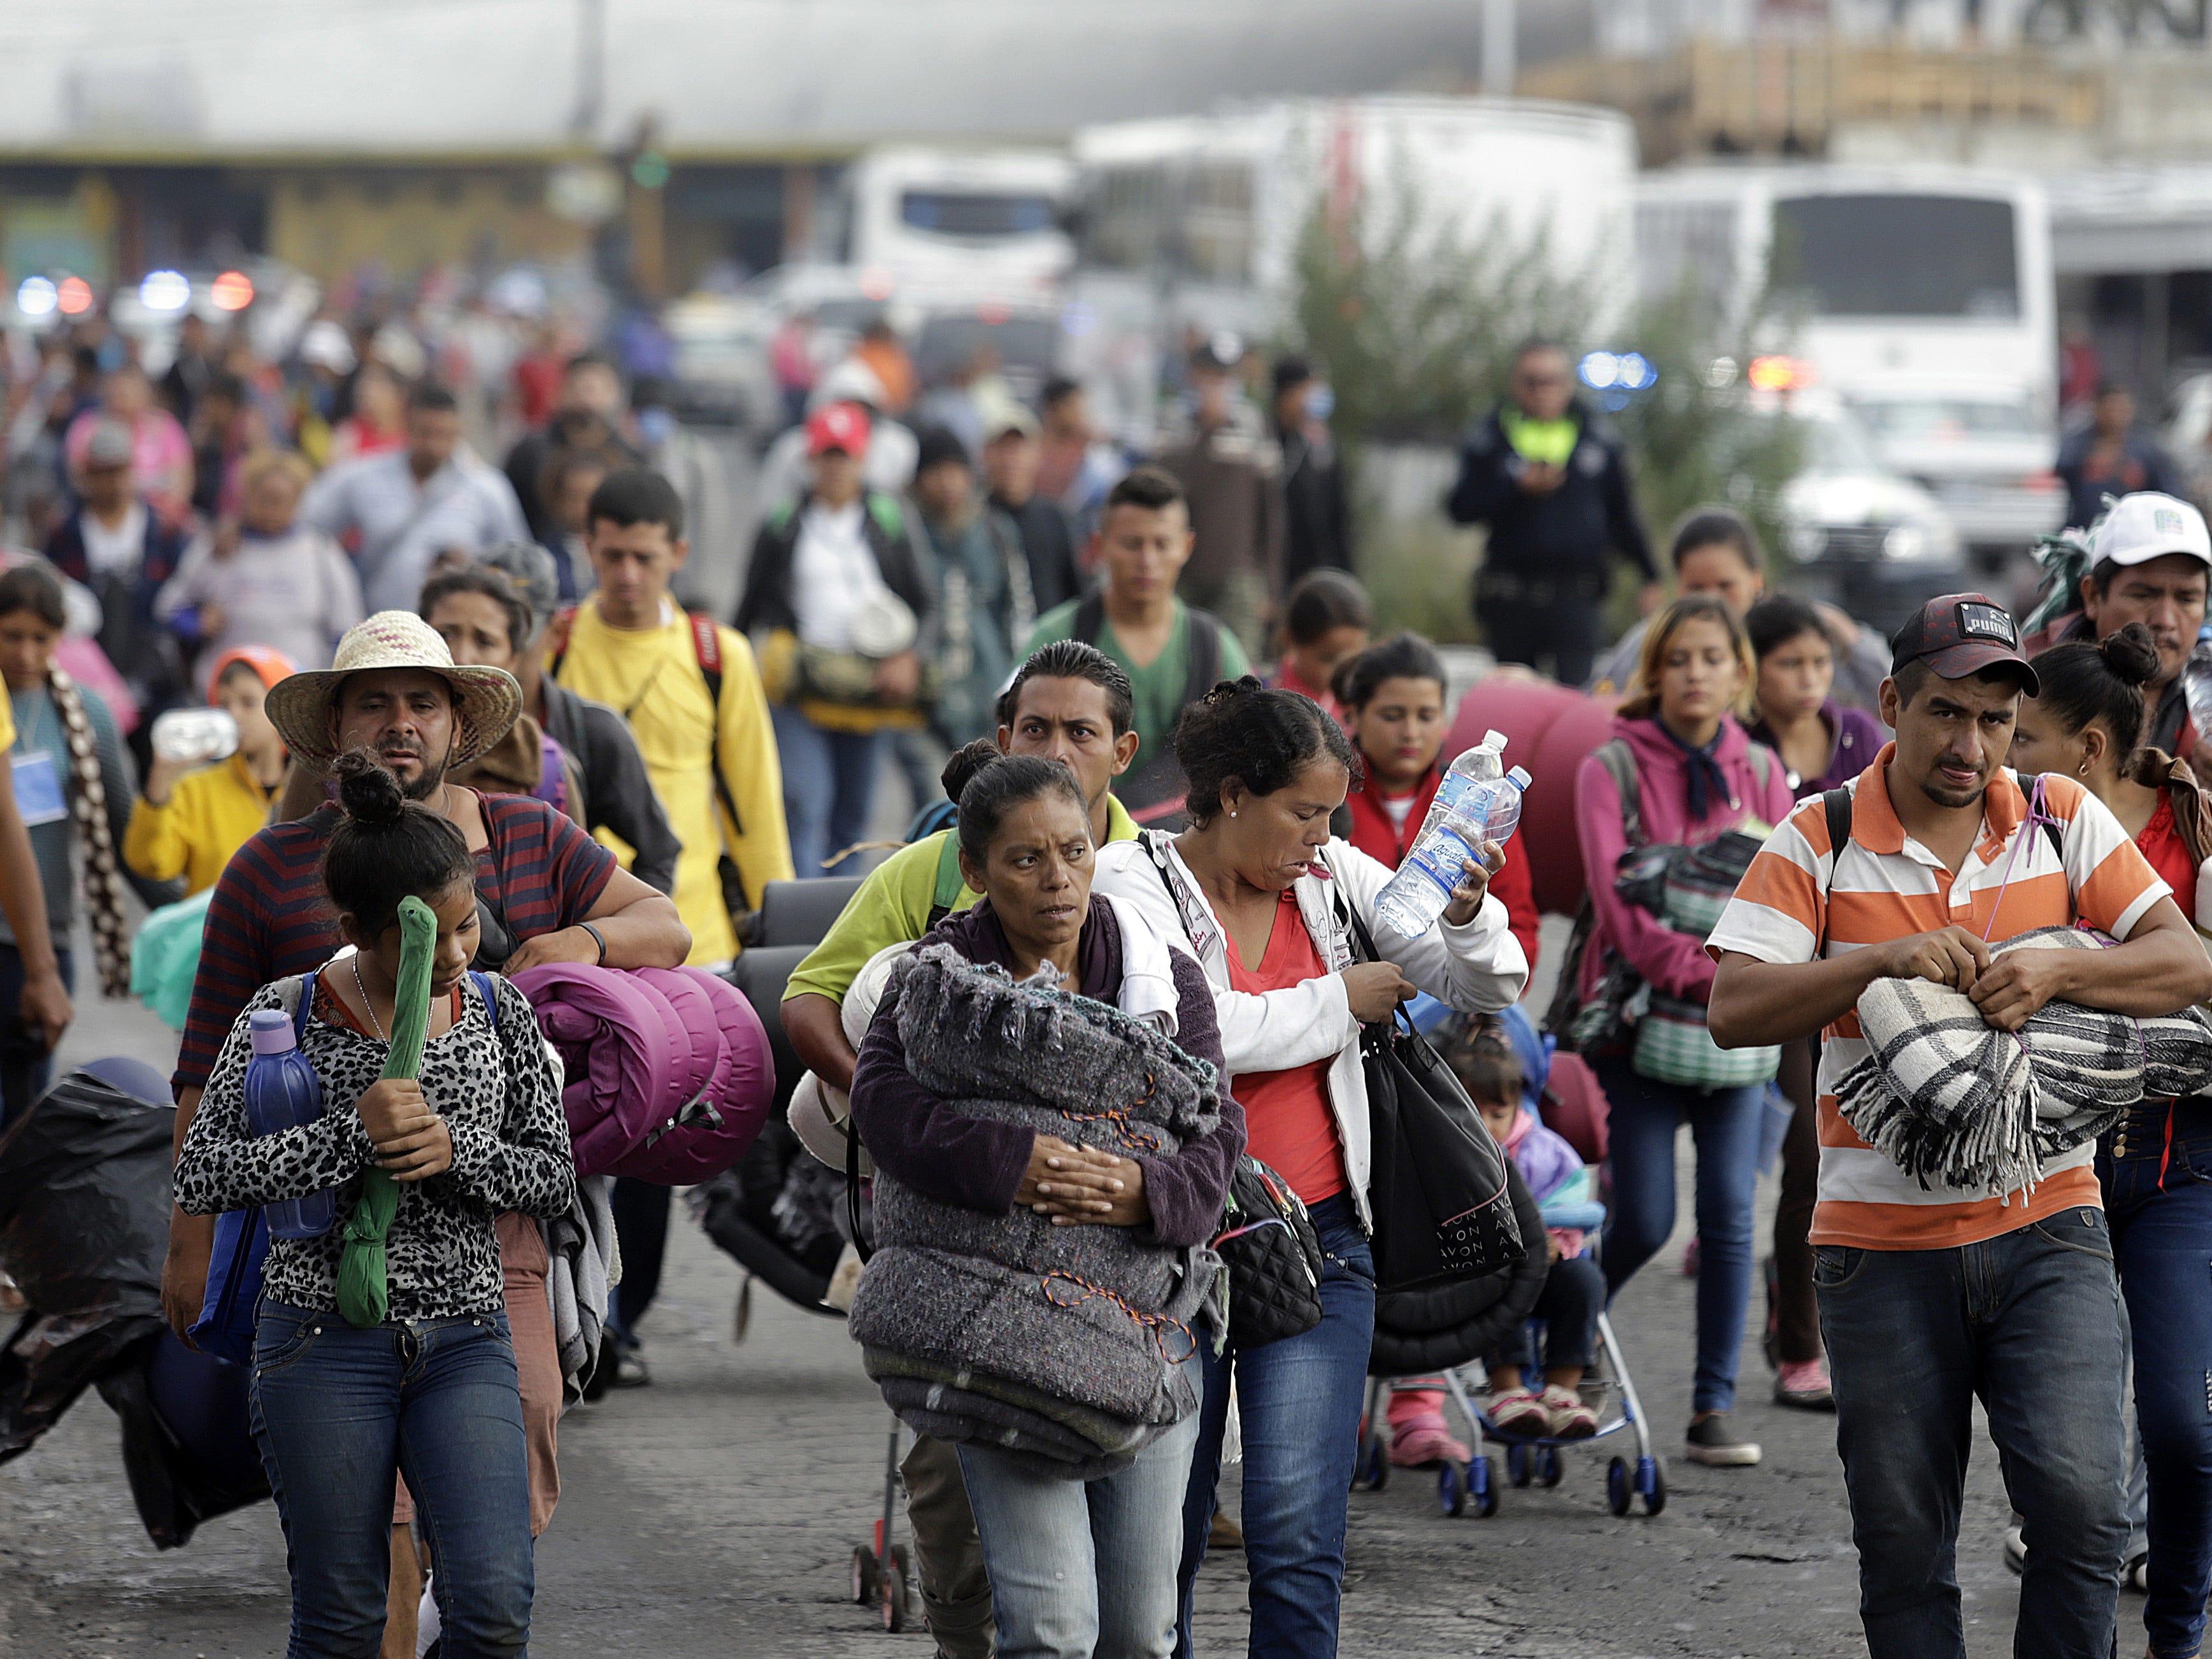 Christians, meet the caravan